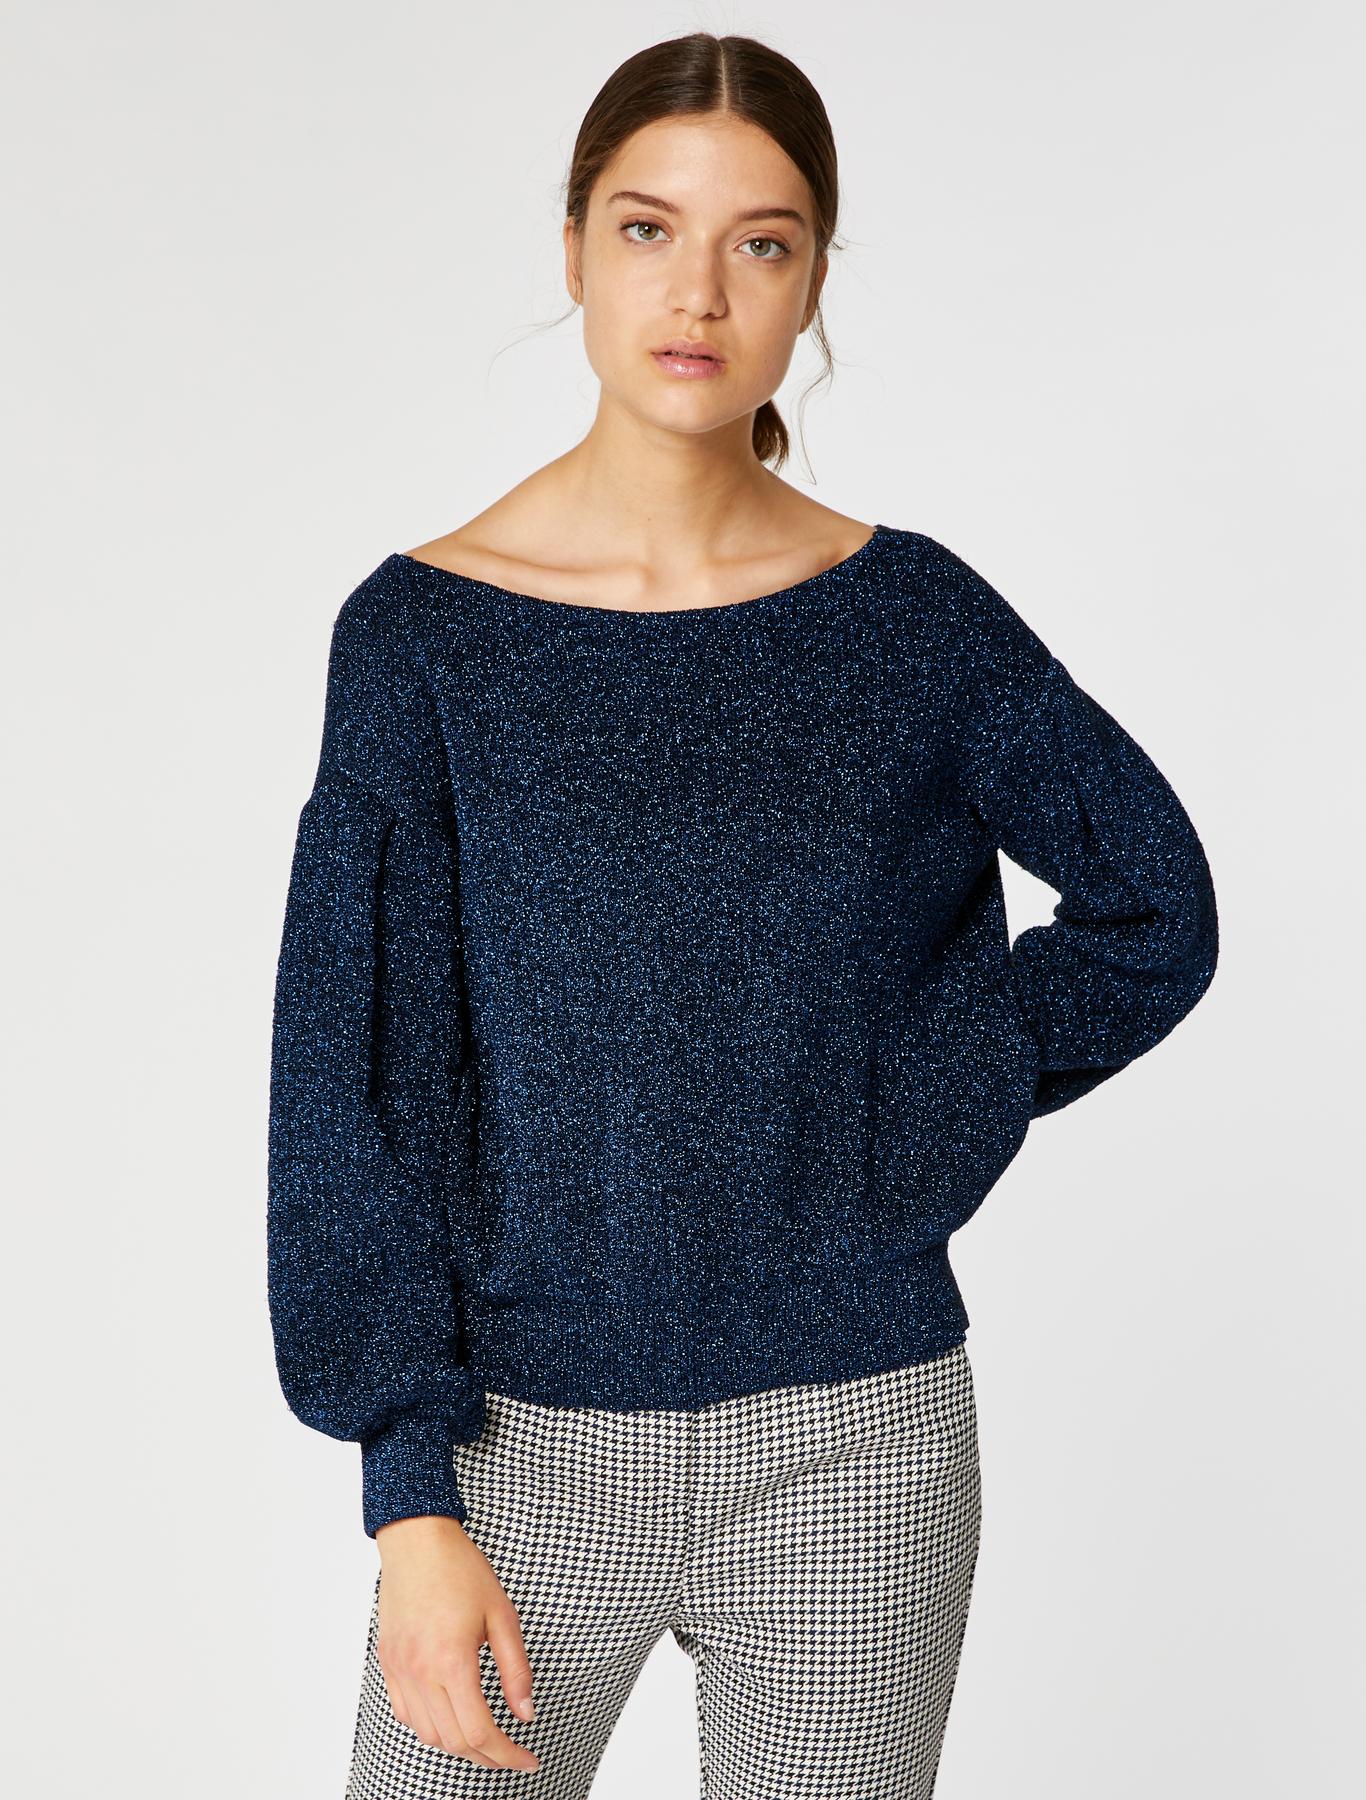 Blue Sweater Lamé amp;co Max Oversized Navy atgnWSRR8